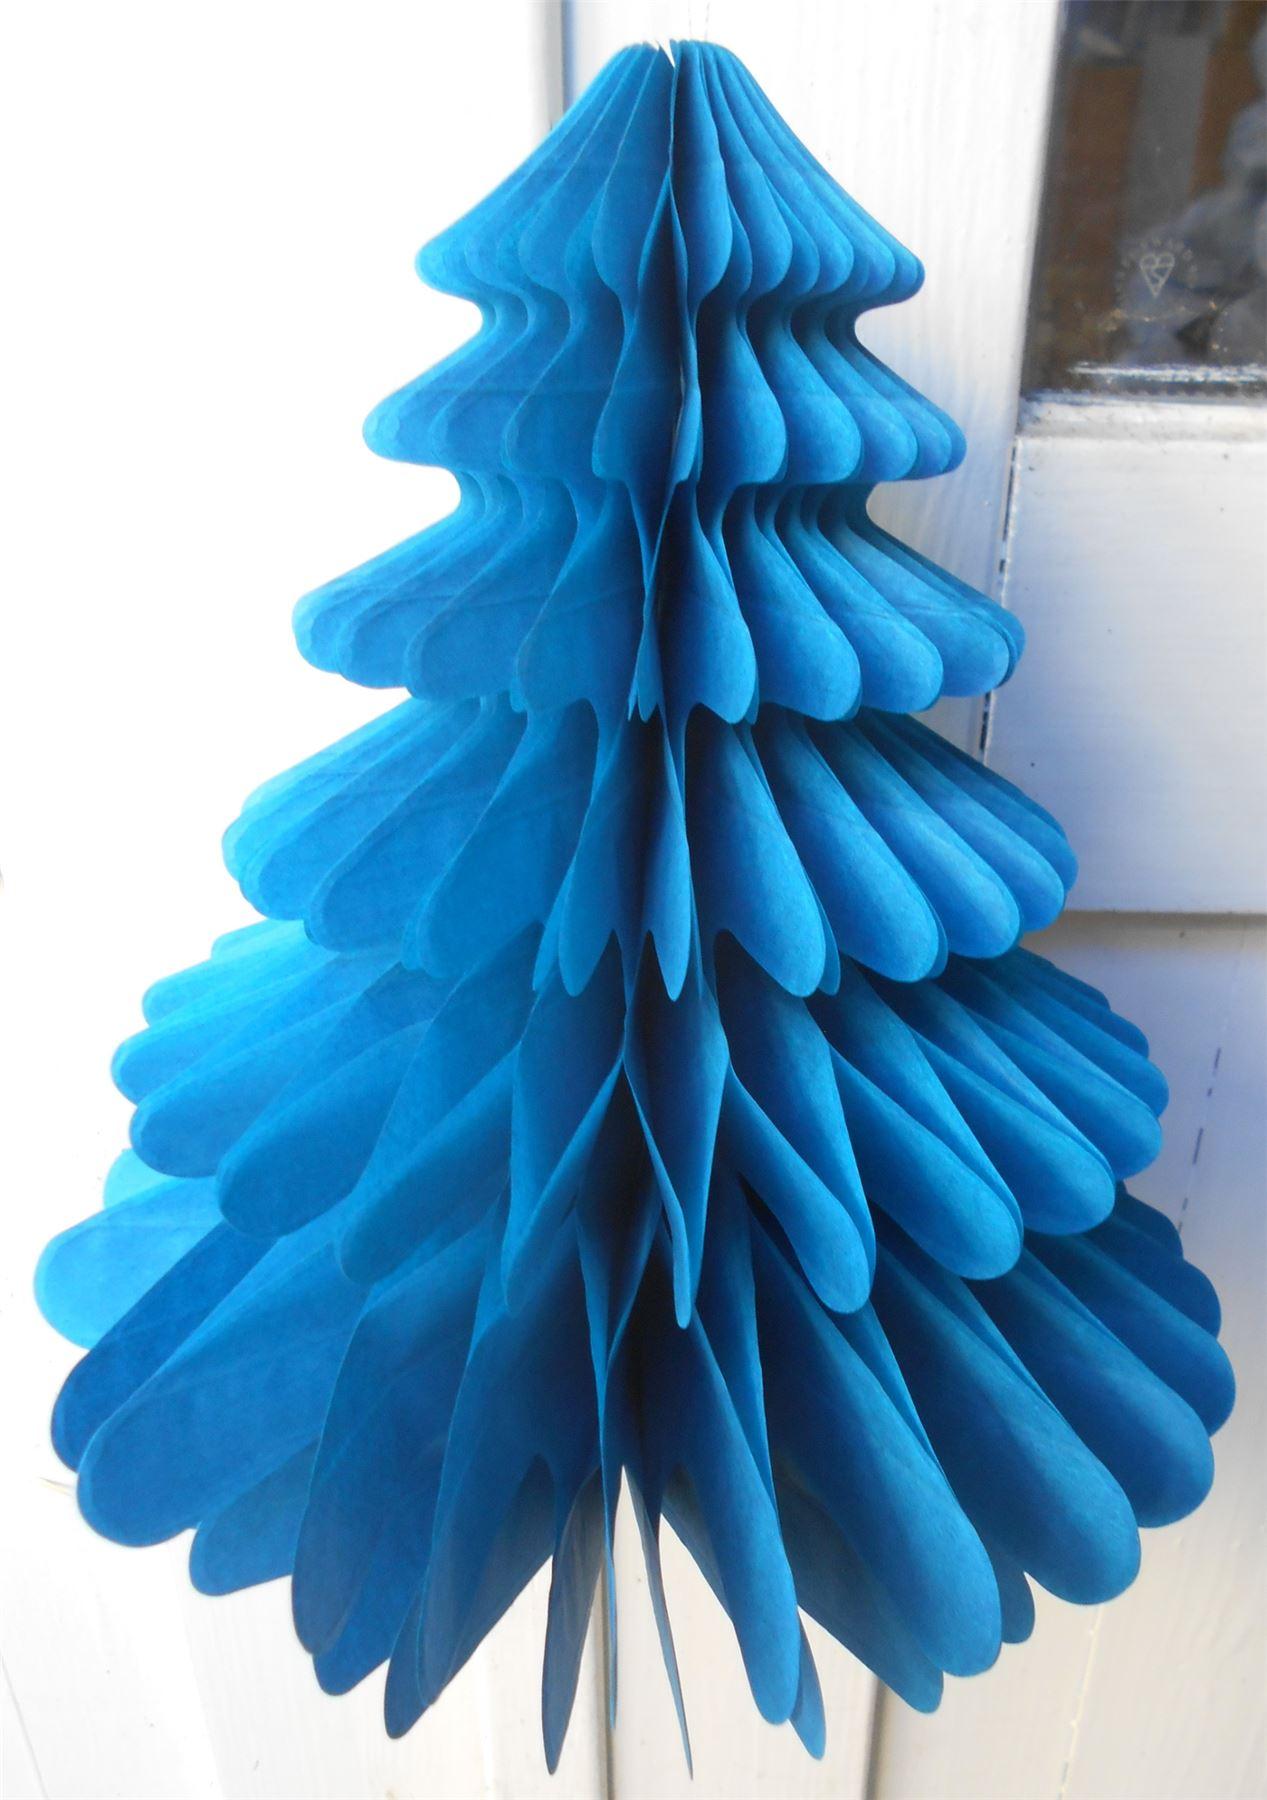 Paper Christmas Decorations.Details About Honeycomb Paper Christmas Decorations 2 X Christmas Trees Sky Blue